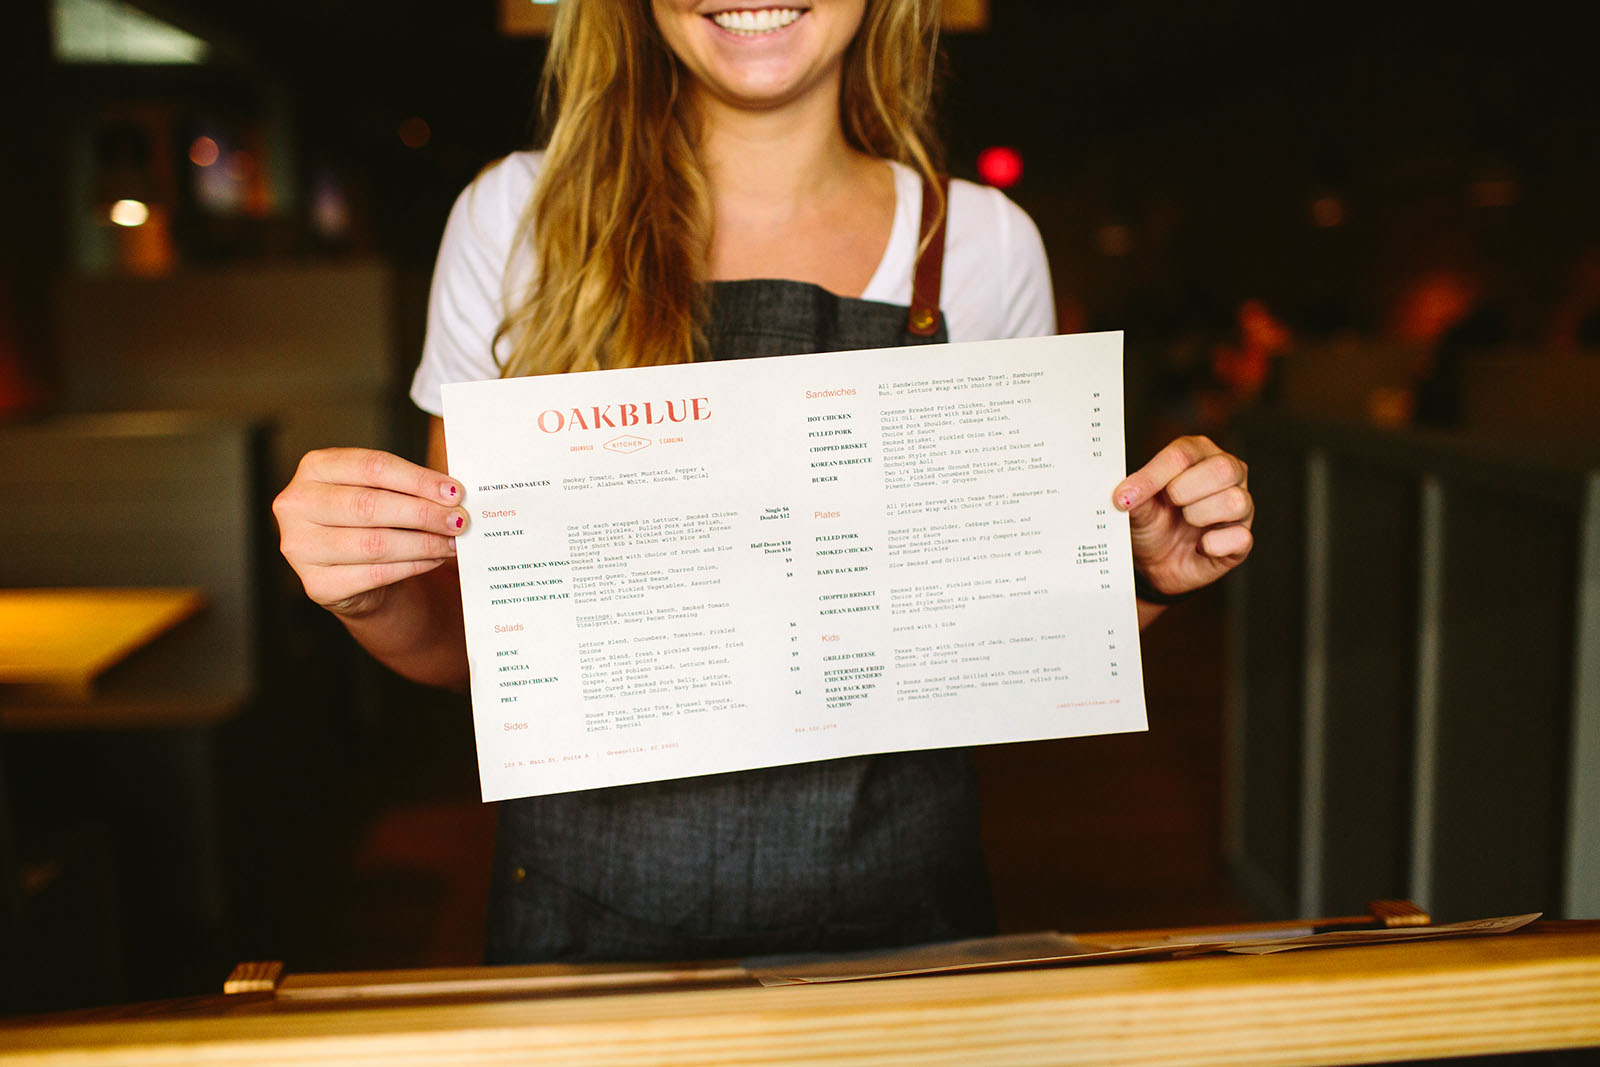 Restaurant photograph of woman holding the Oakblue Kitchen menu design.